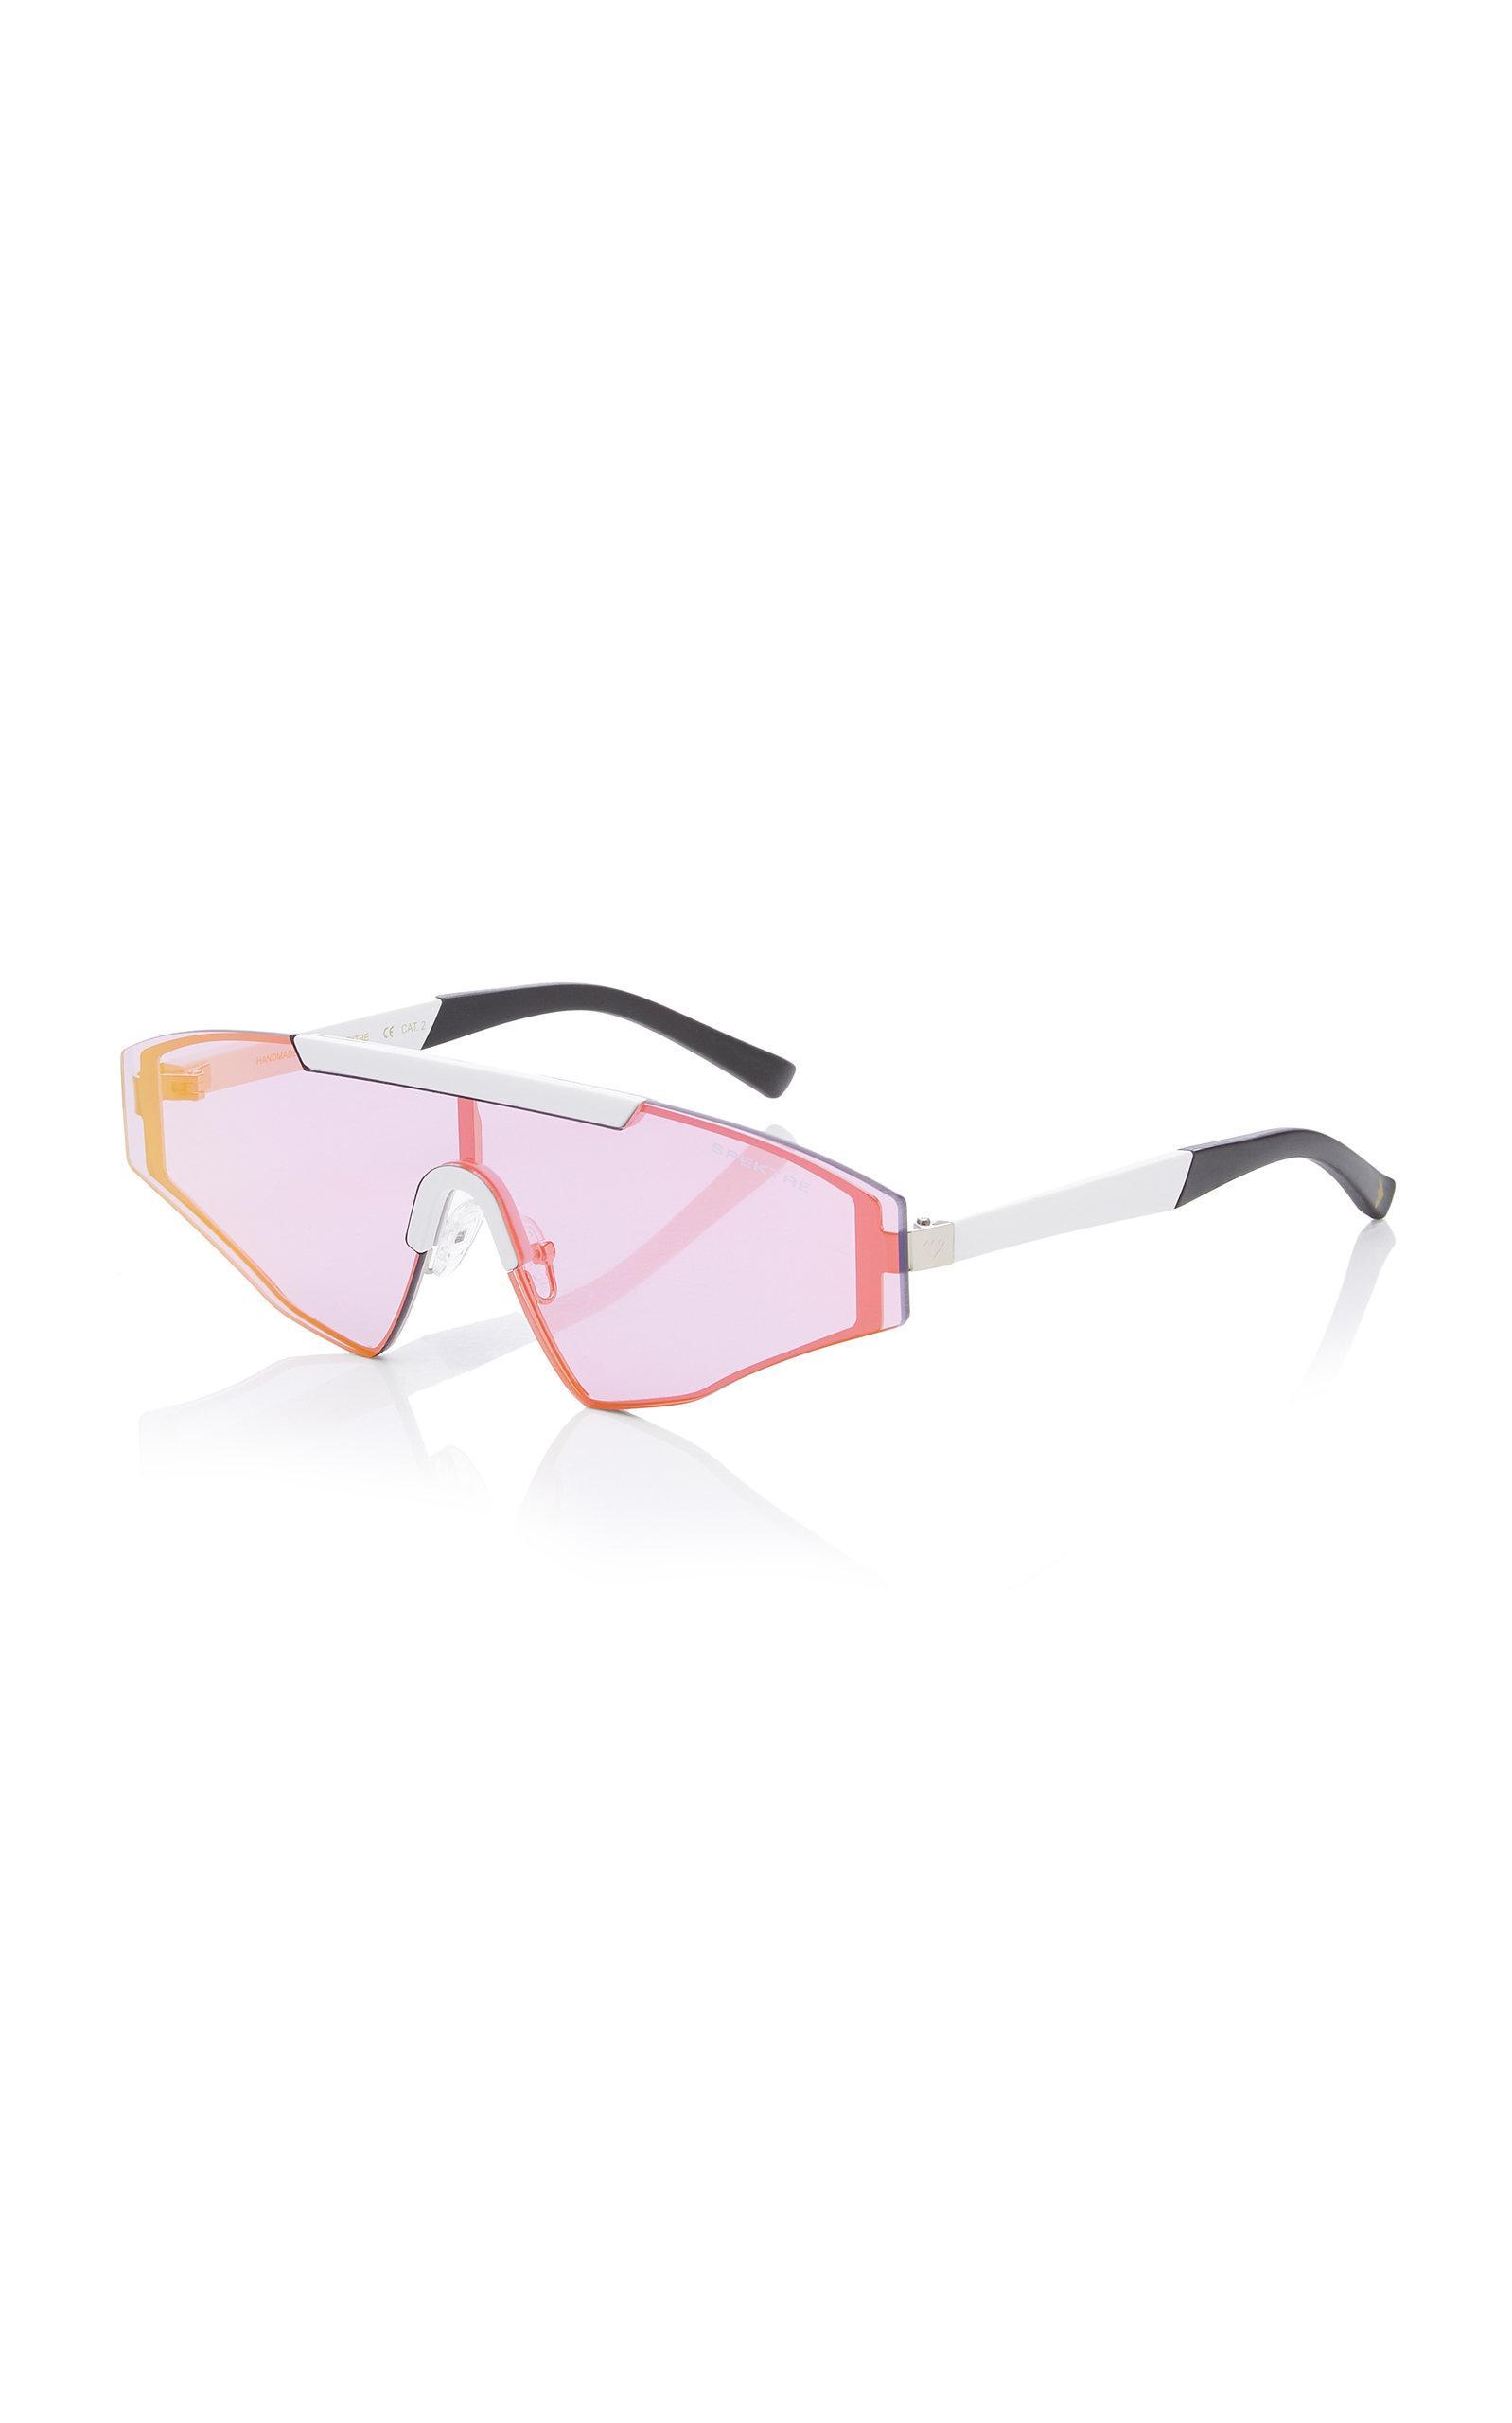 c138af0fd Spektre Vincent Aviator-style Gunmetal-tone Sunglasses in Blue - Lyst